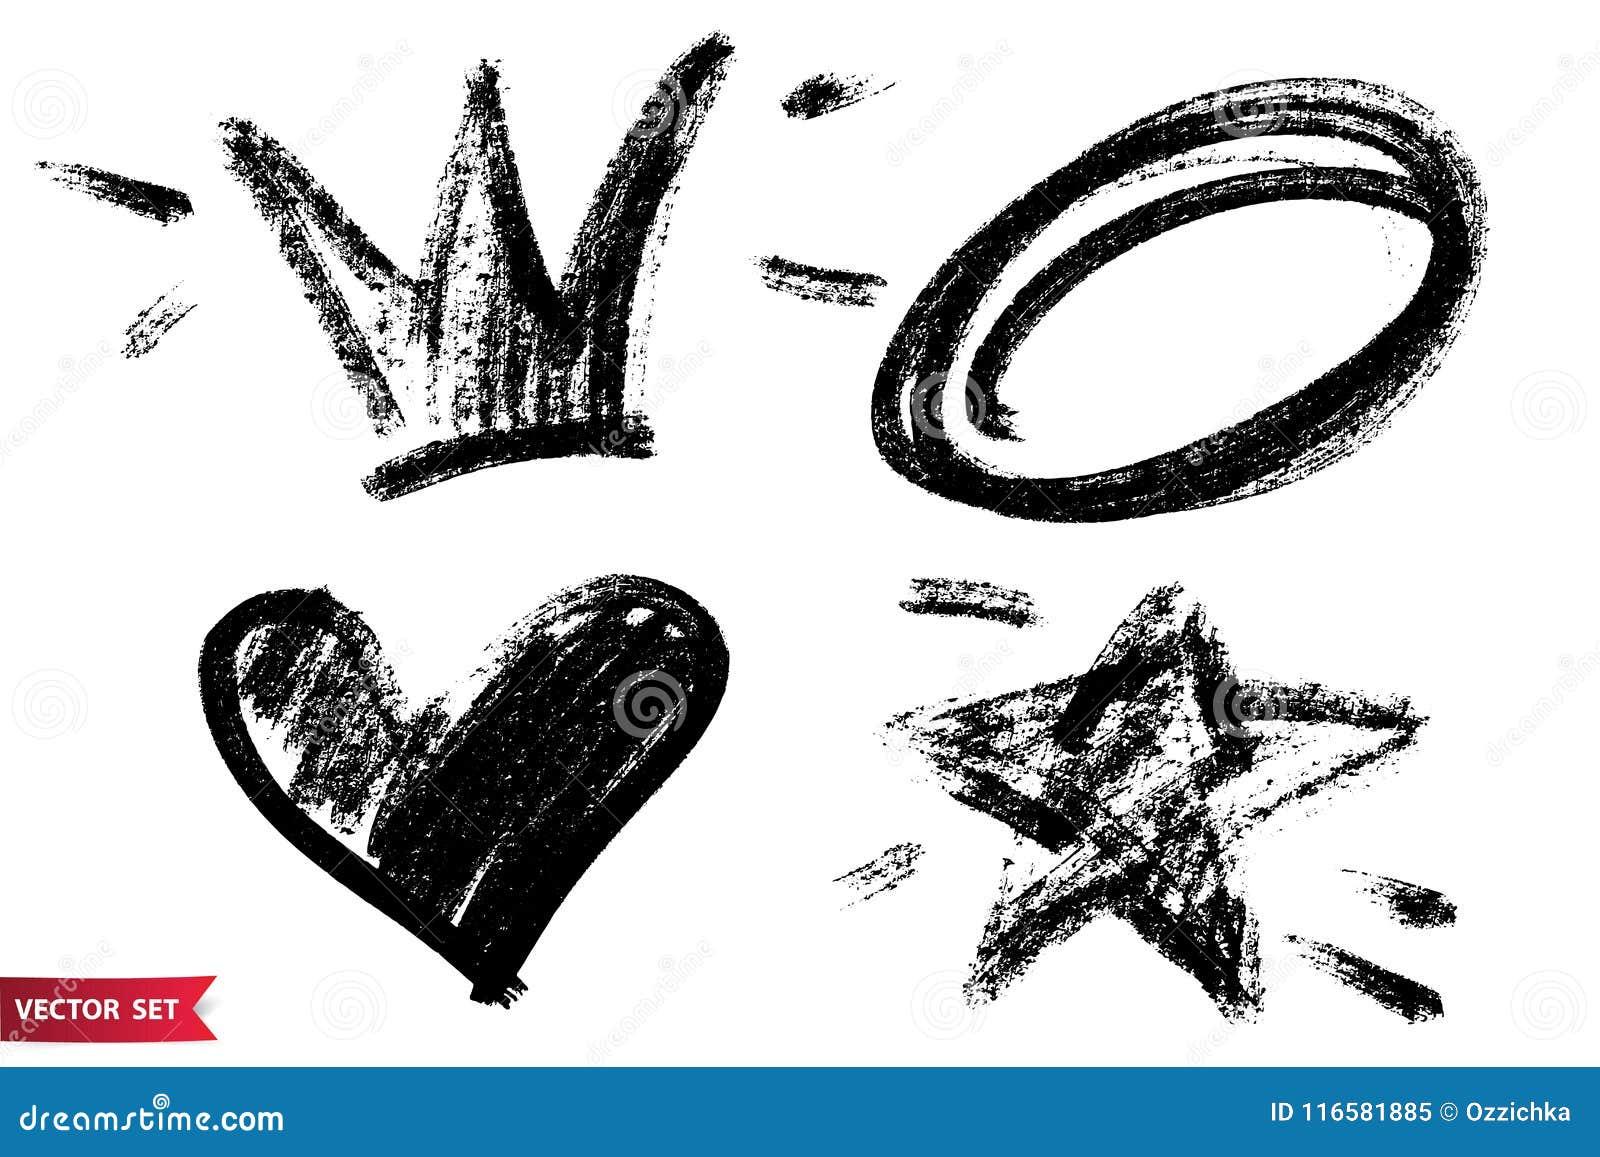 Vector Set Of Hand Drawn Dry Brush Symbols Black Charcoal Hand